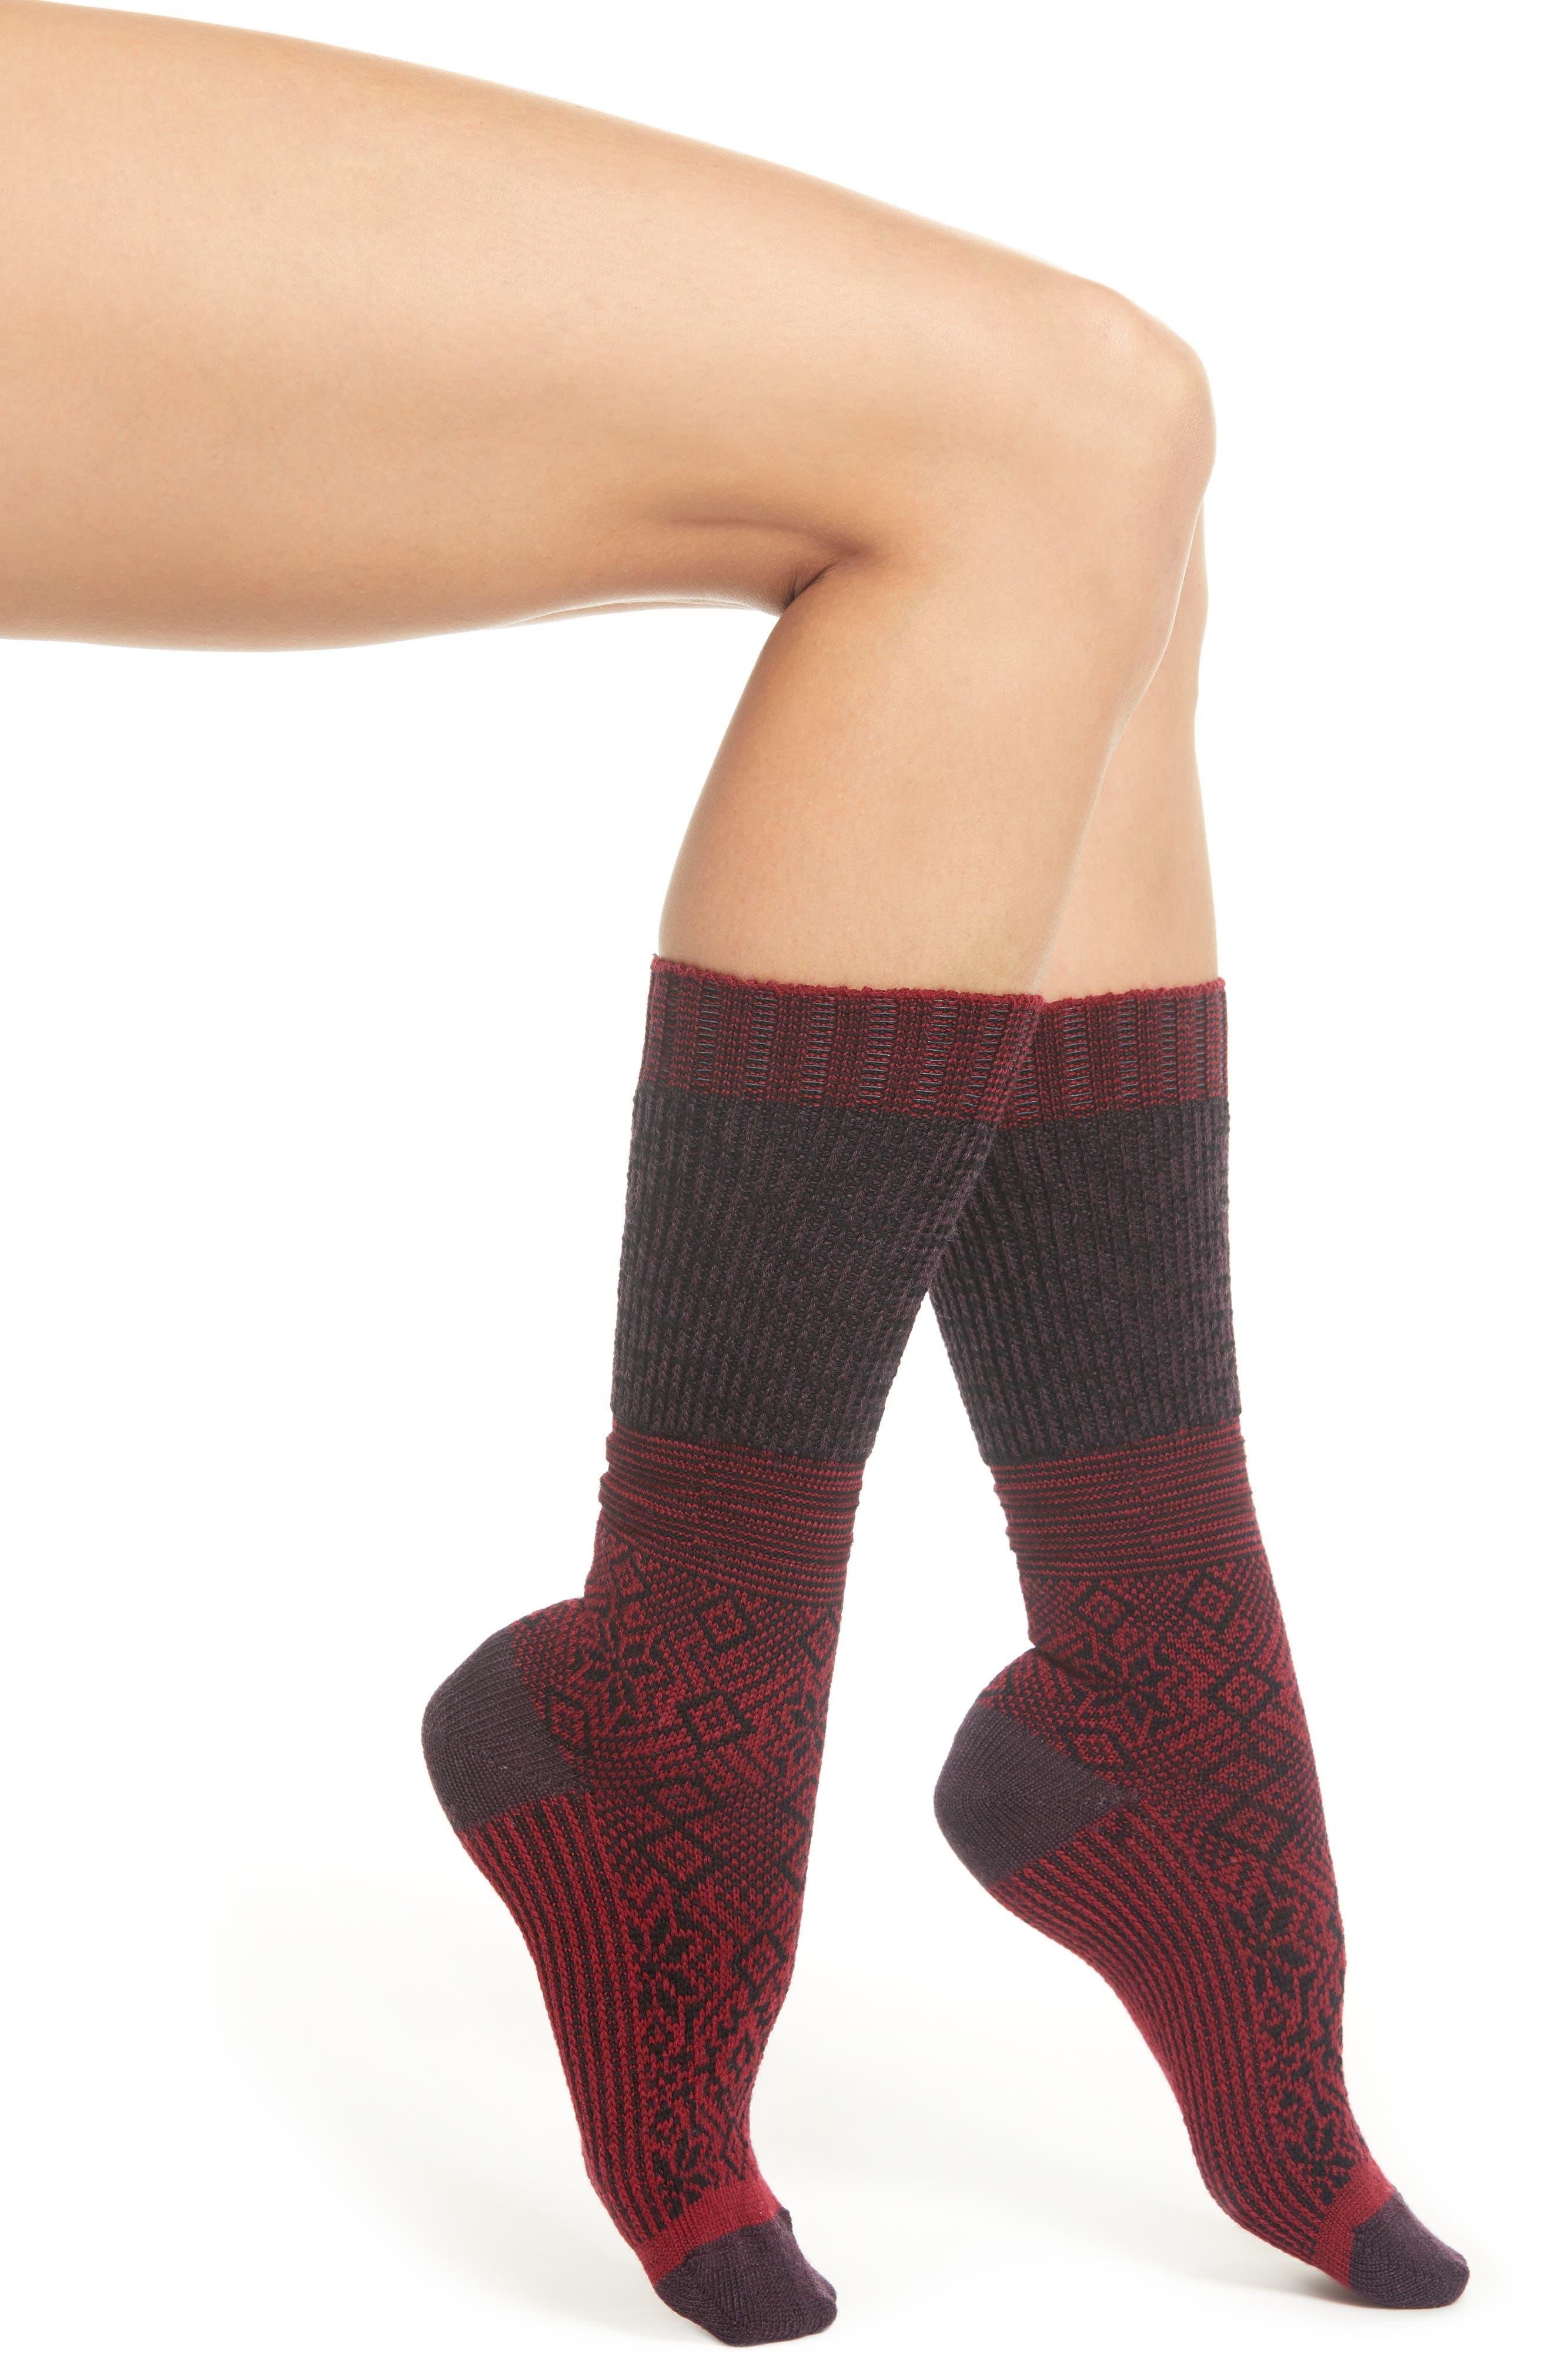 Snowflake Flurry Merino Wool Blend Socks,                         Main,                         color, TIBETAN RED HEATHER